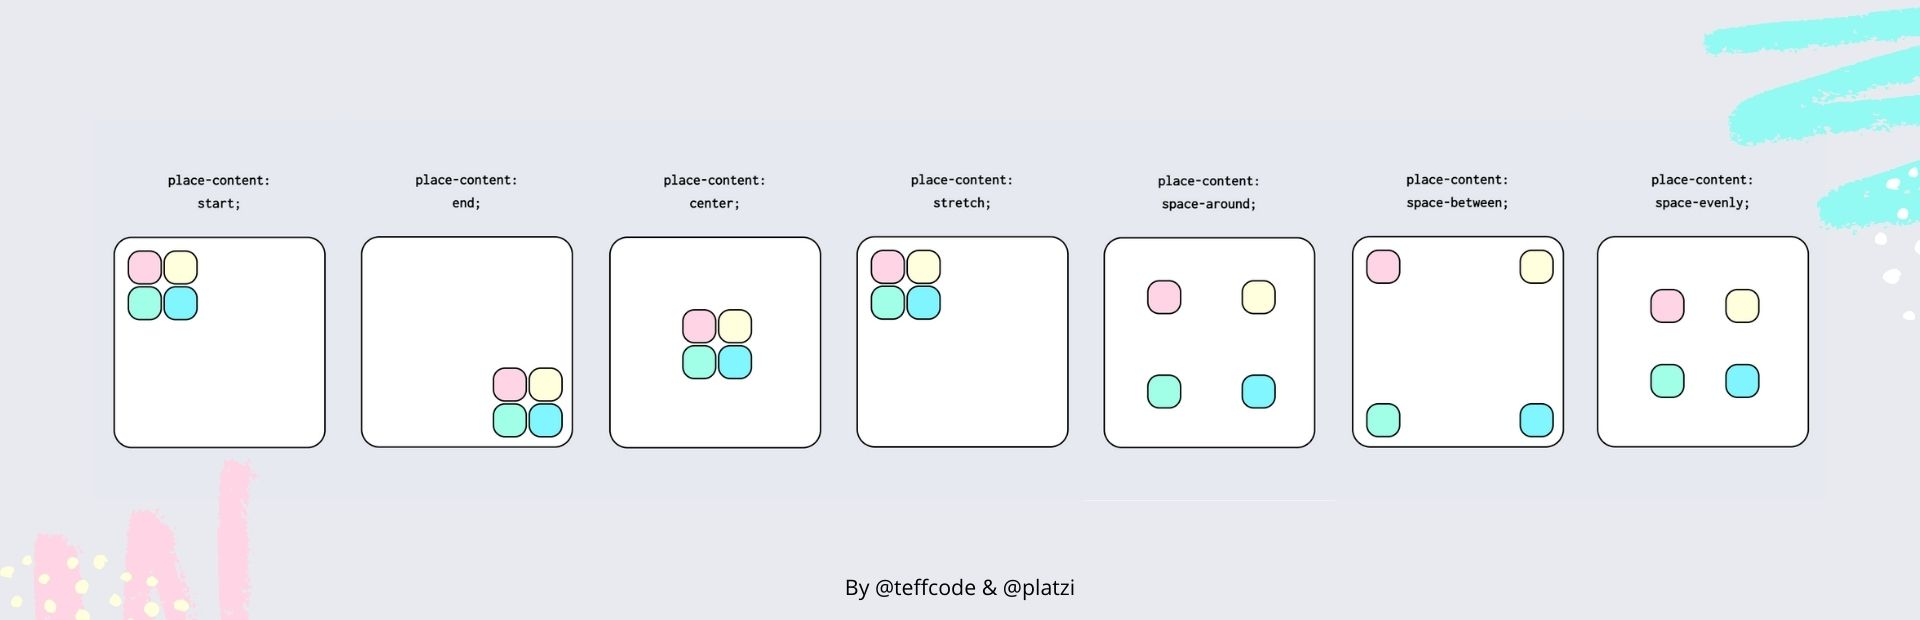 CSS Grid Place Content